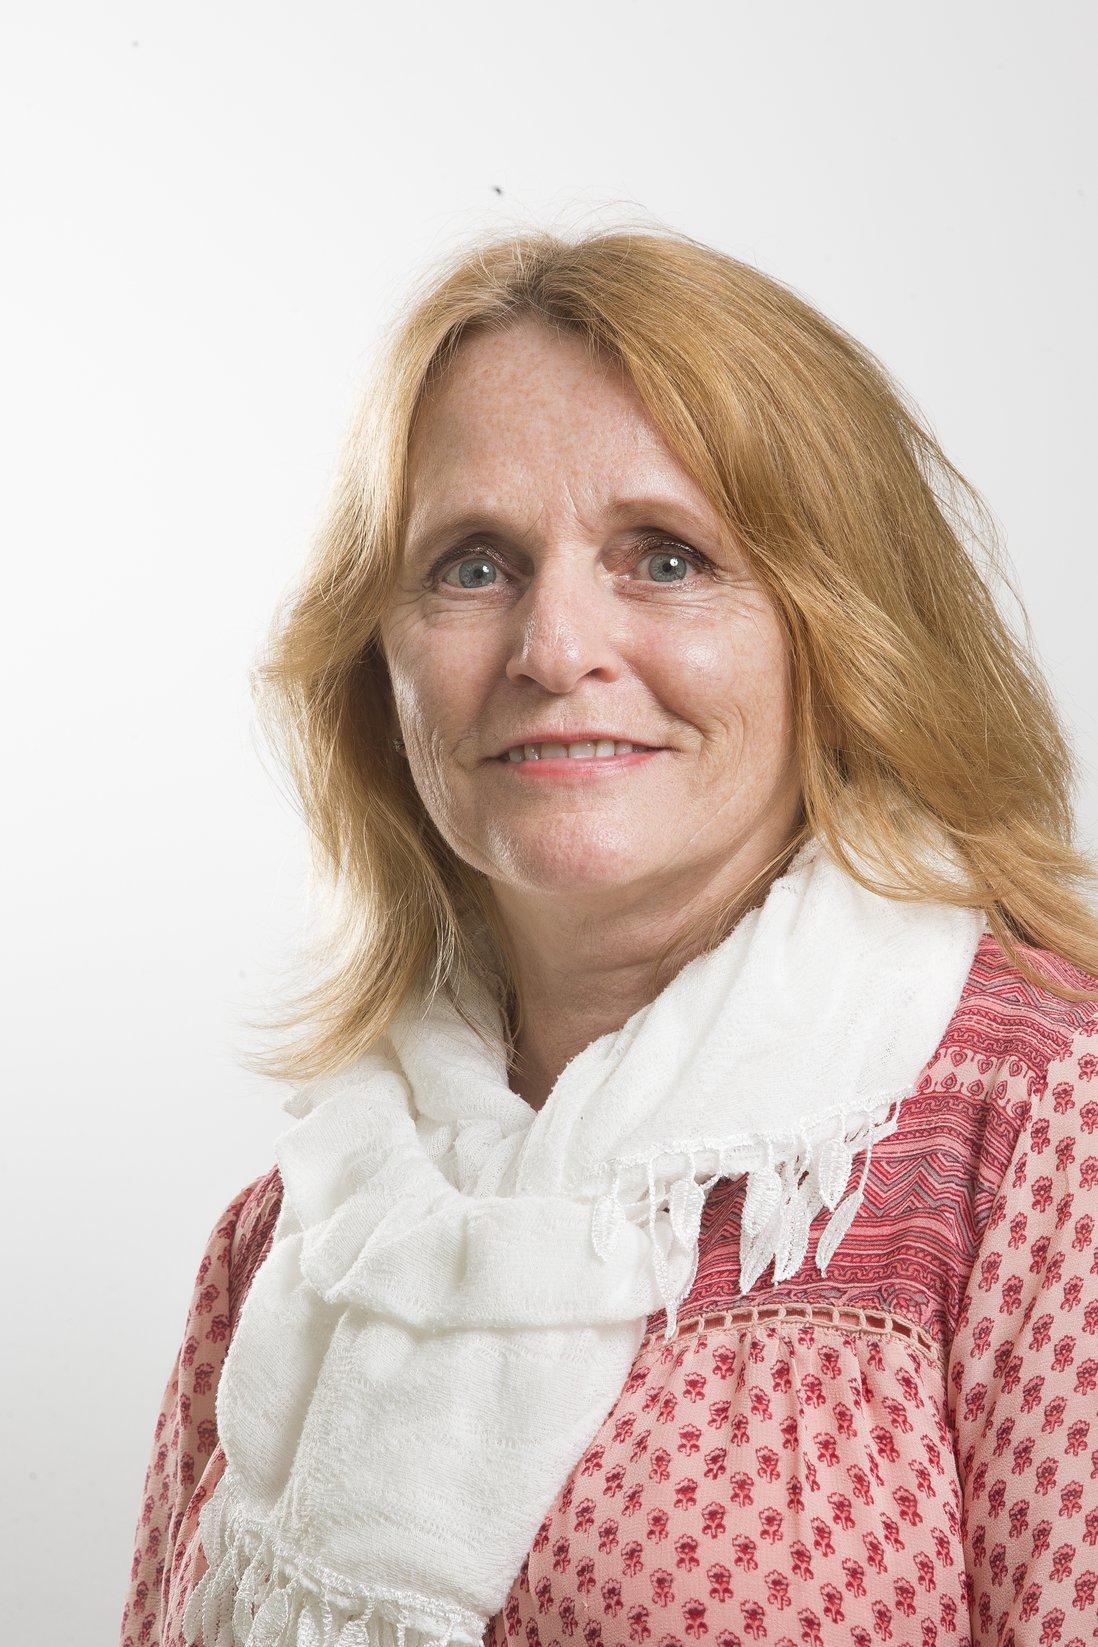 Thale Kinne Rønqvist